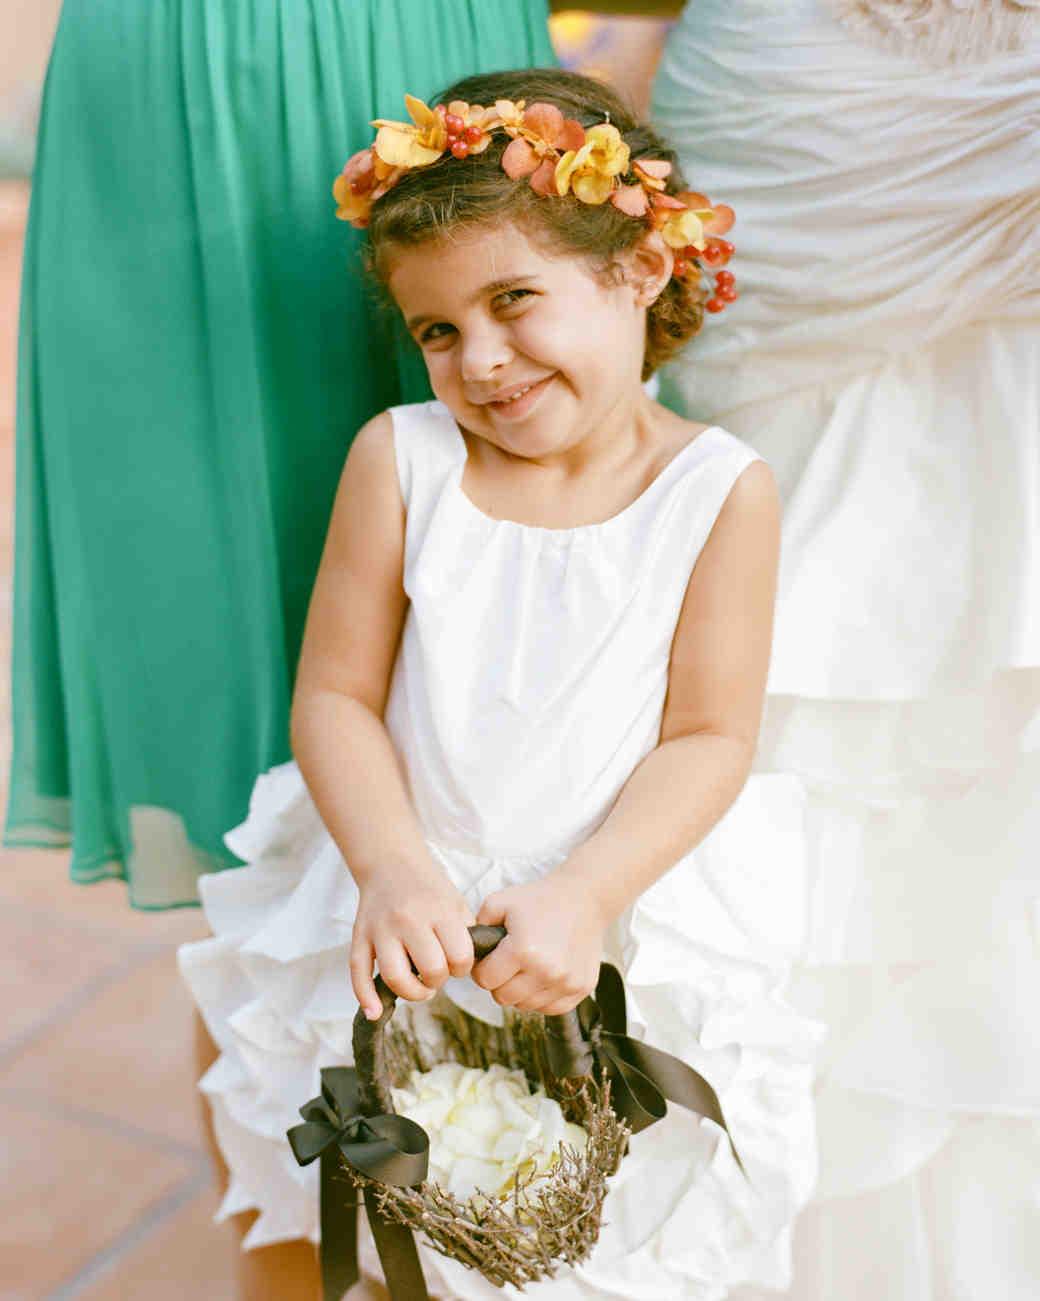 liz-allen-wedding-flowergirl-0249-s111494-0914.jpg